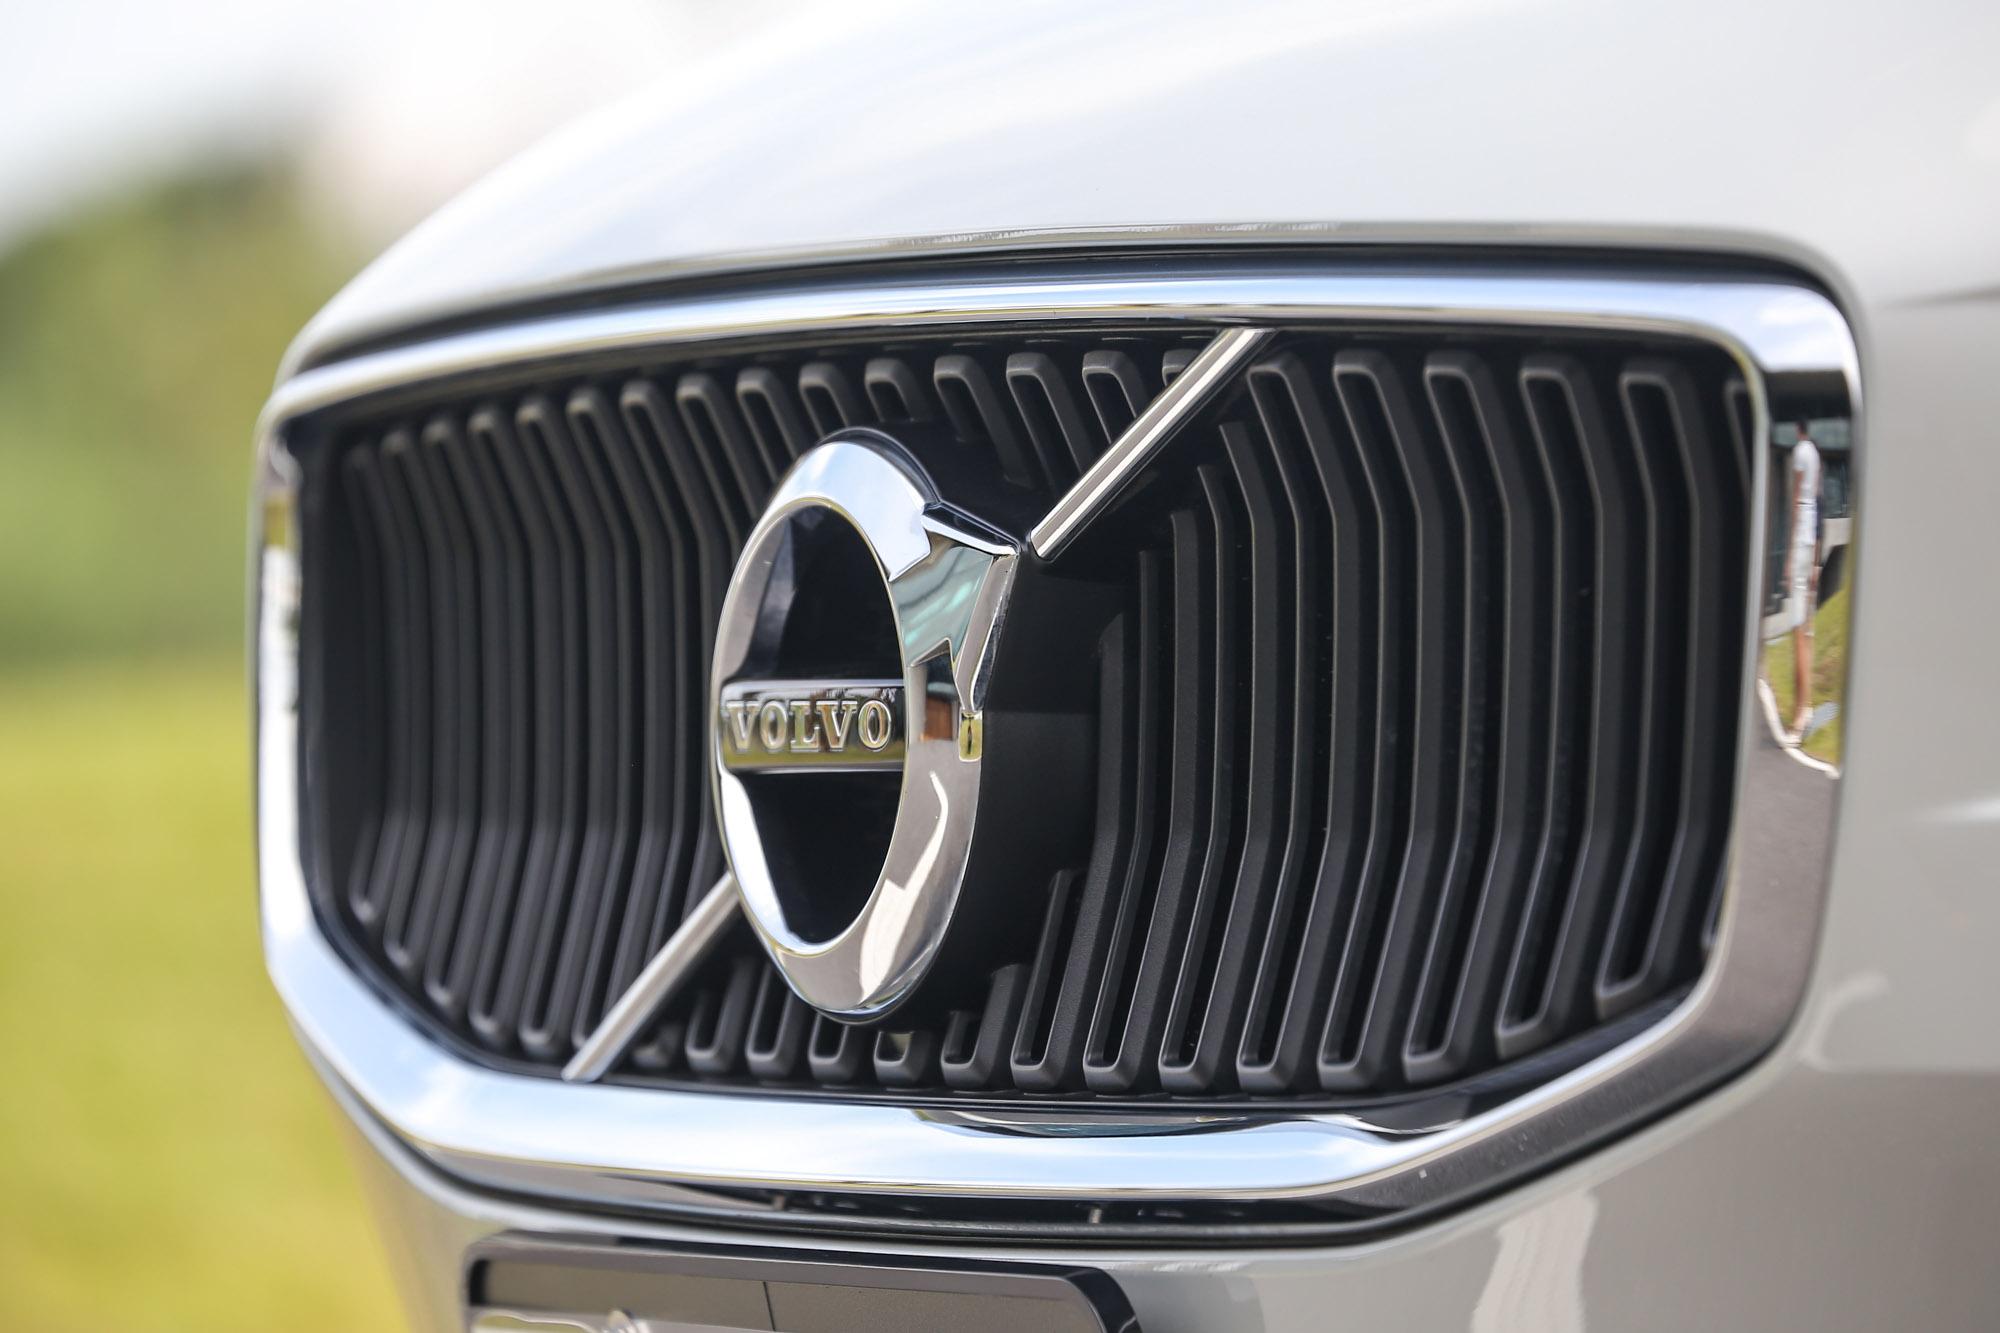 T4 Momentum 車型搭配專屬亮黑直式水箱護罩。